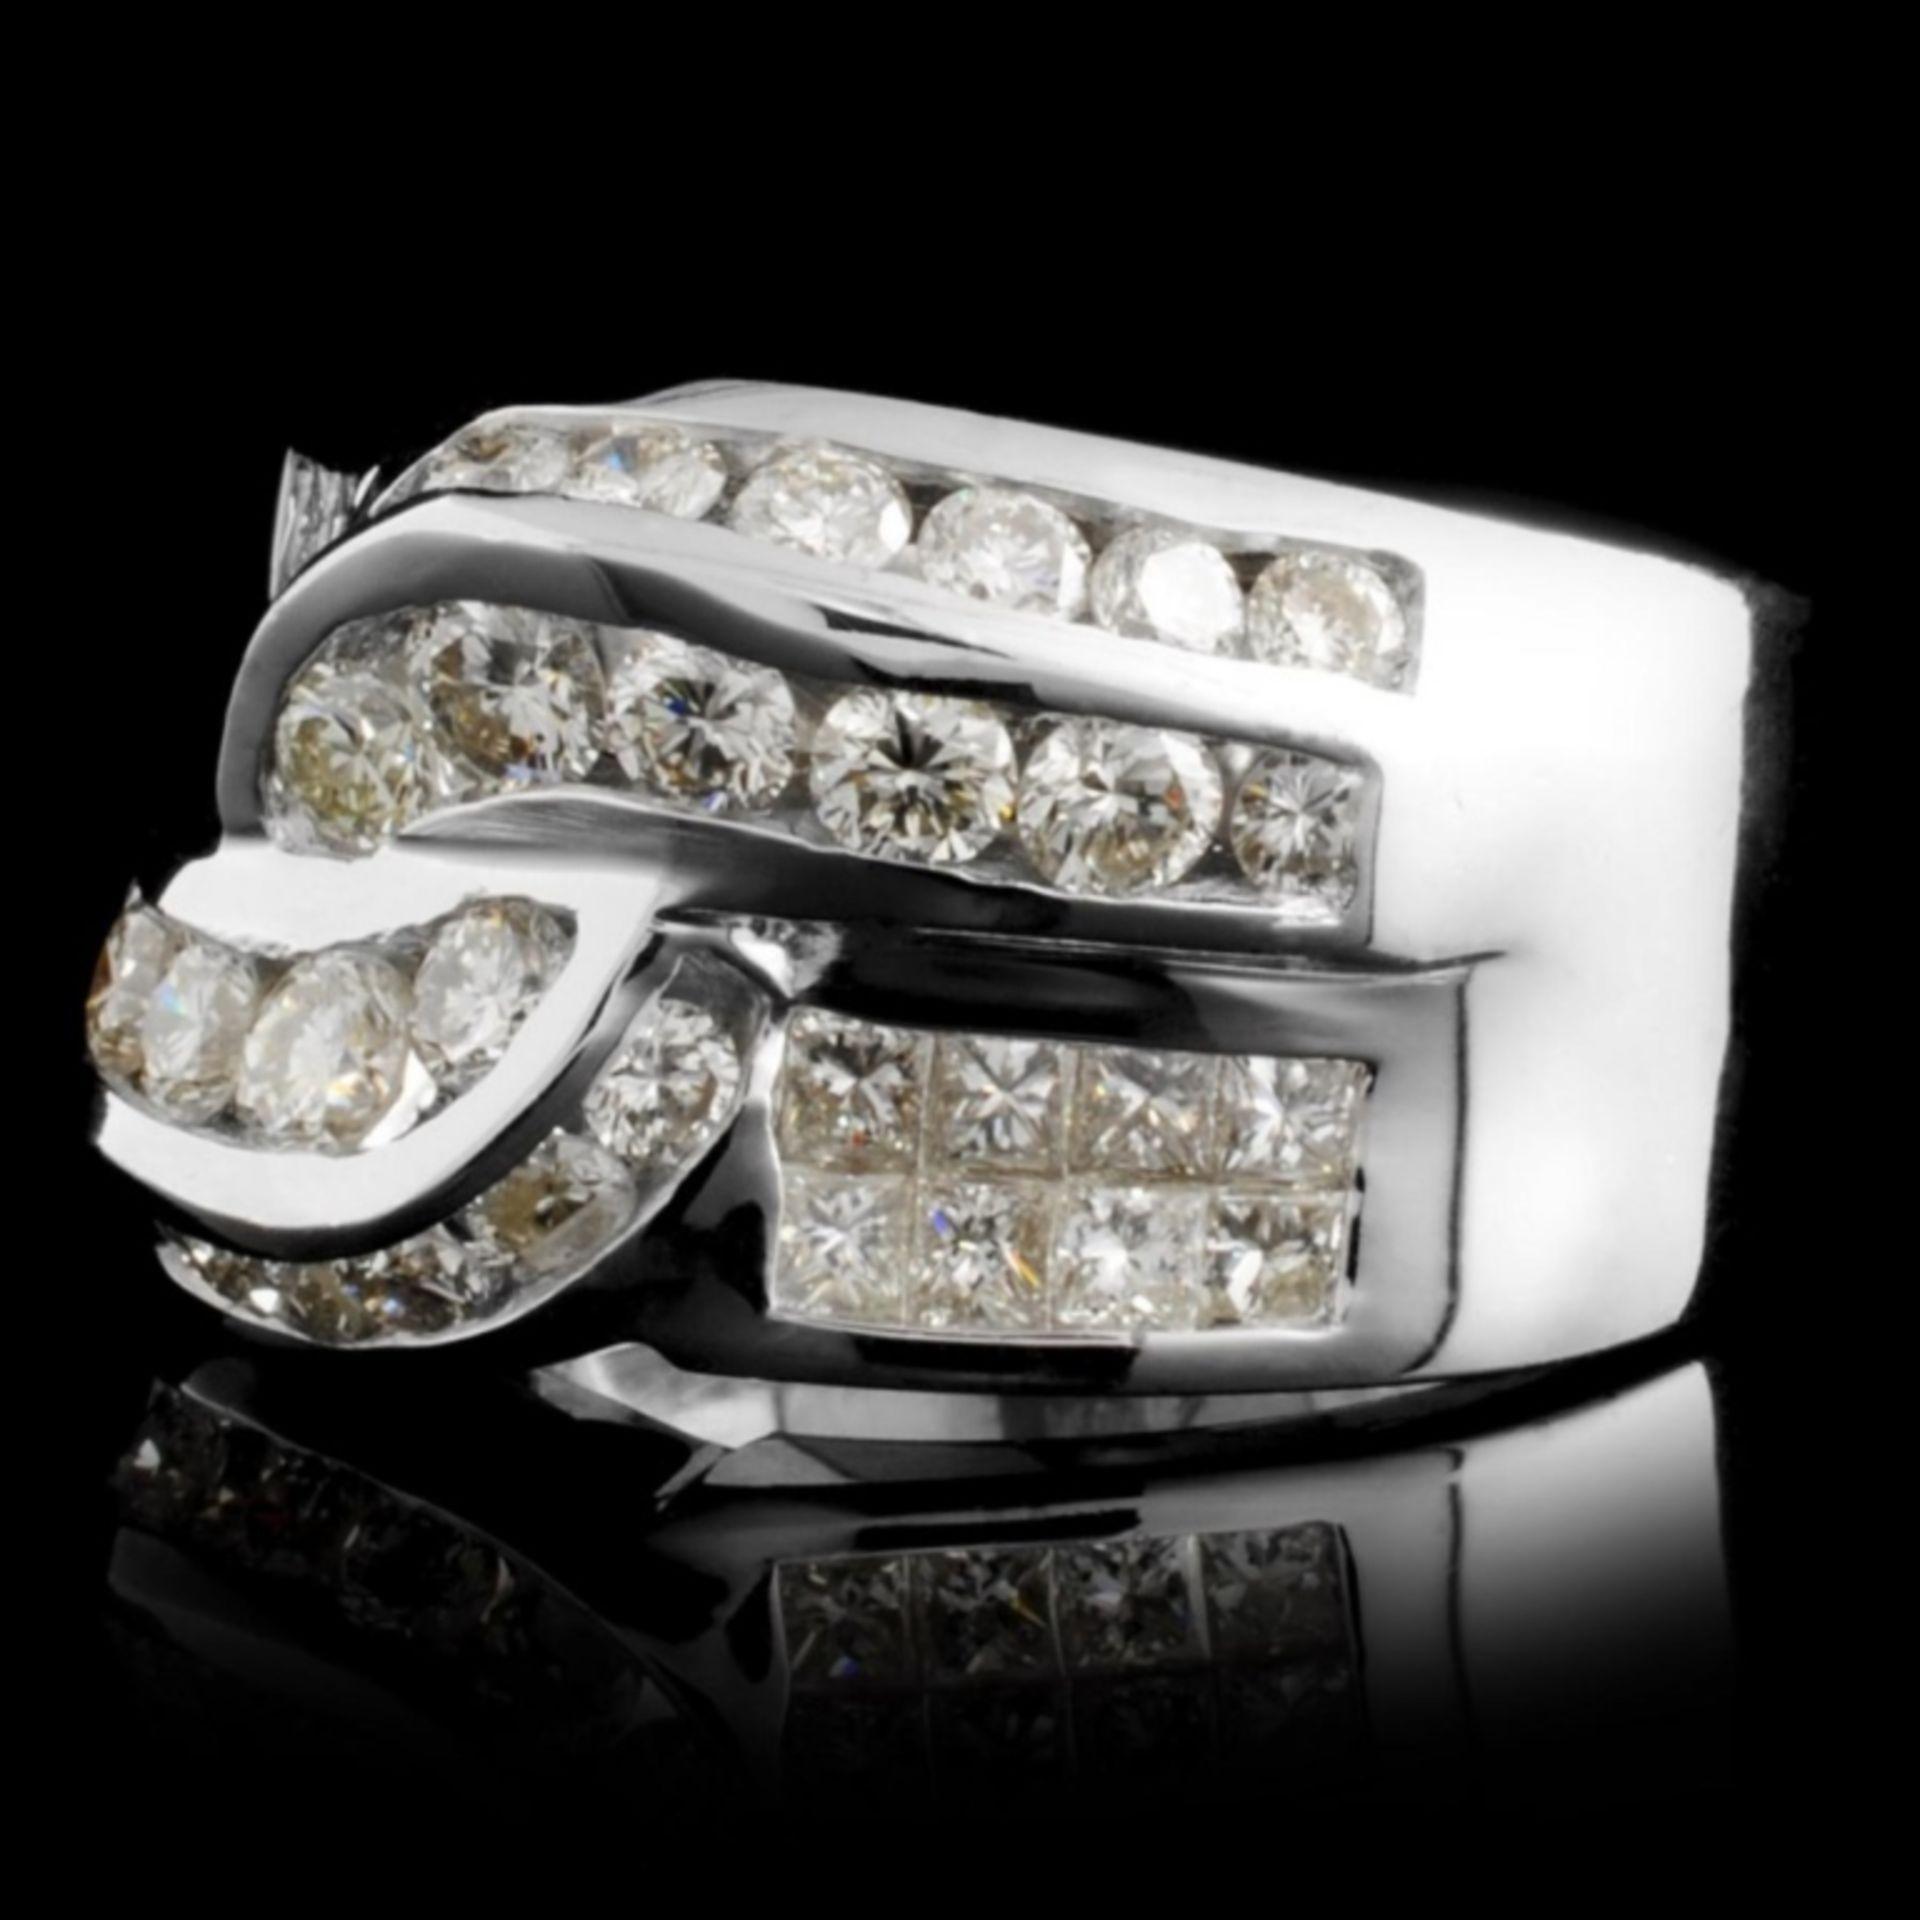 18K White Gold 2.18ctw Diamond Ring - Image 2 of 3